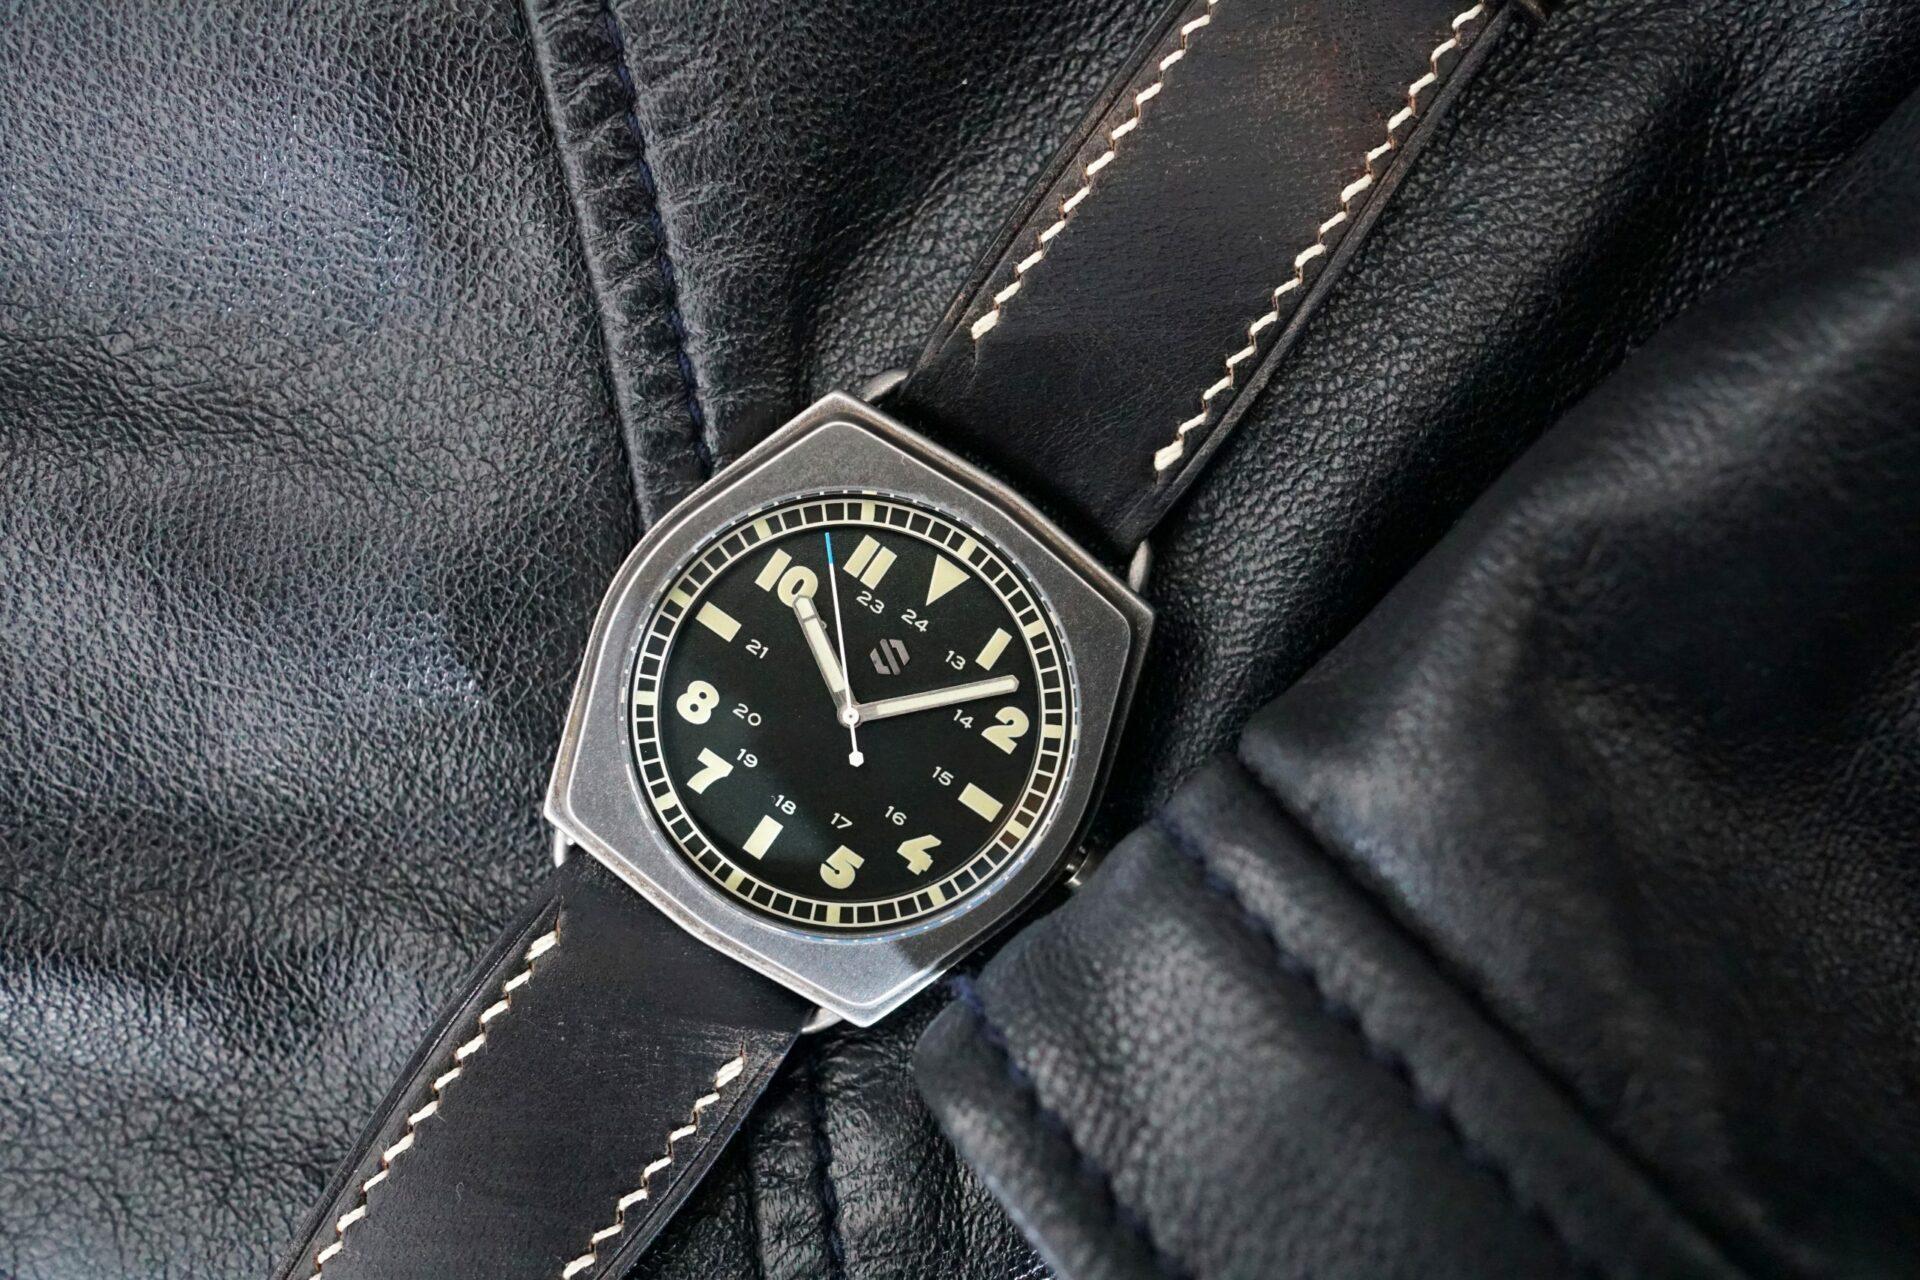 HANDS-ON: The Seals Watch Co Model C Field Explorer